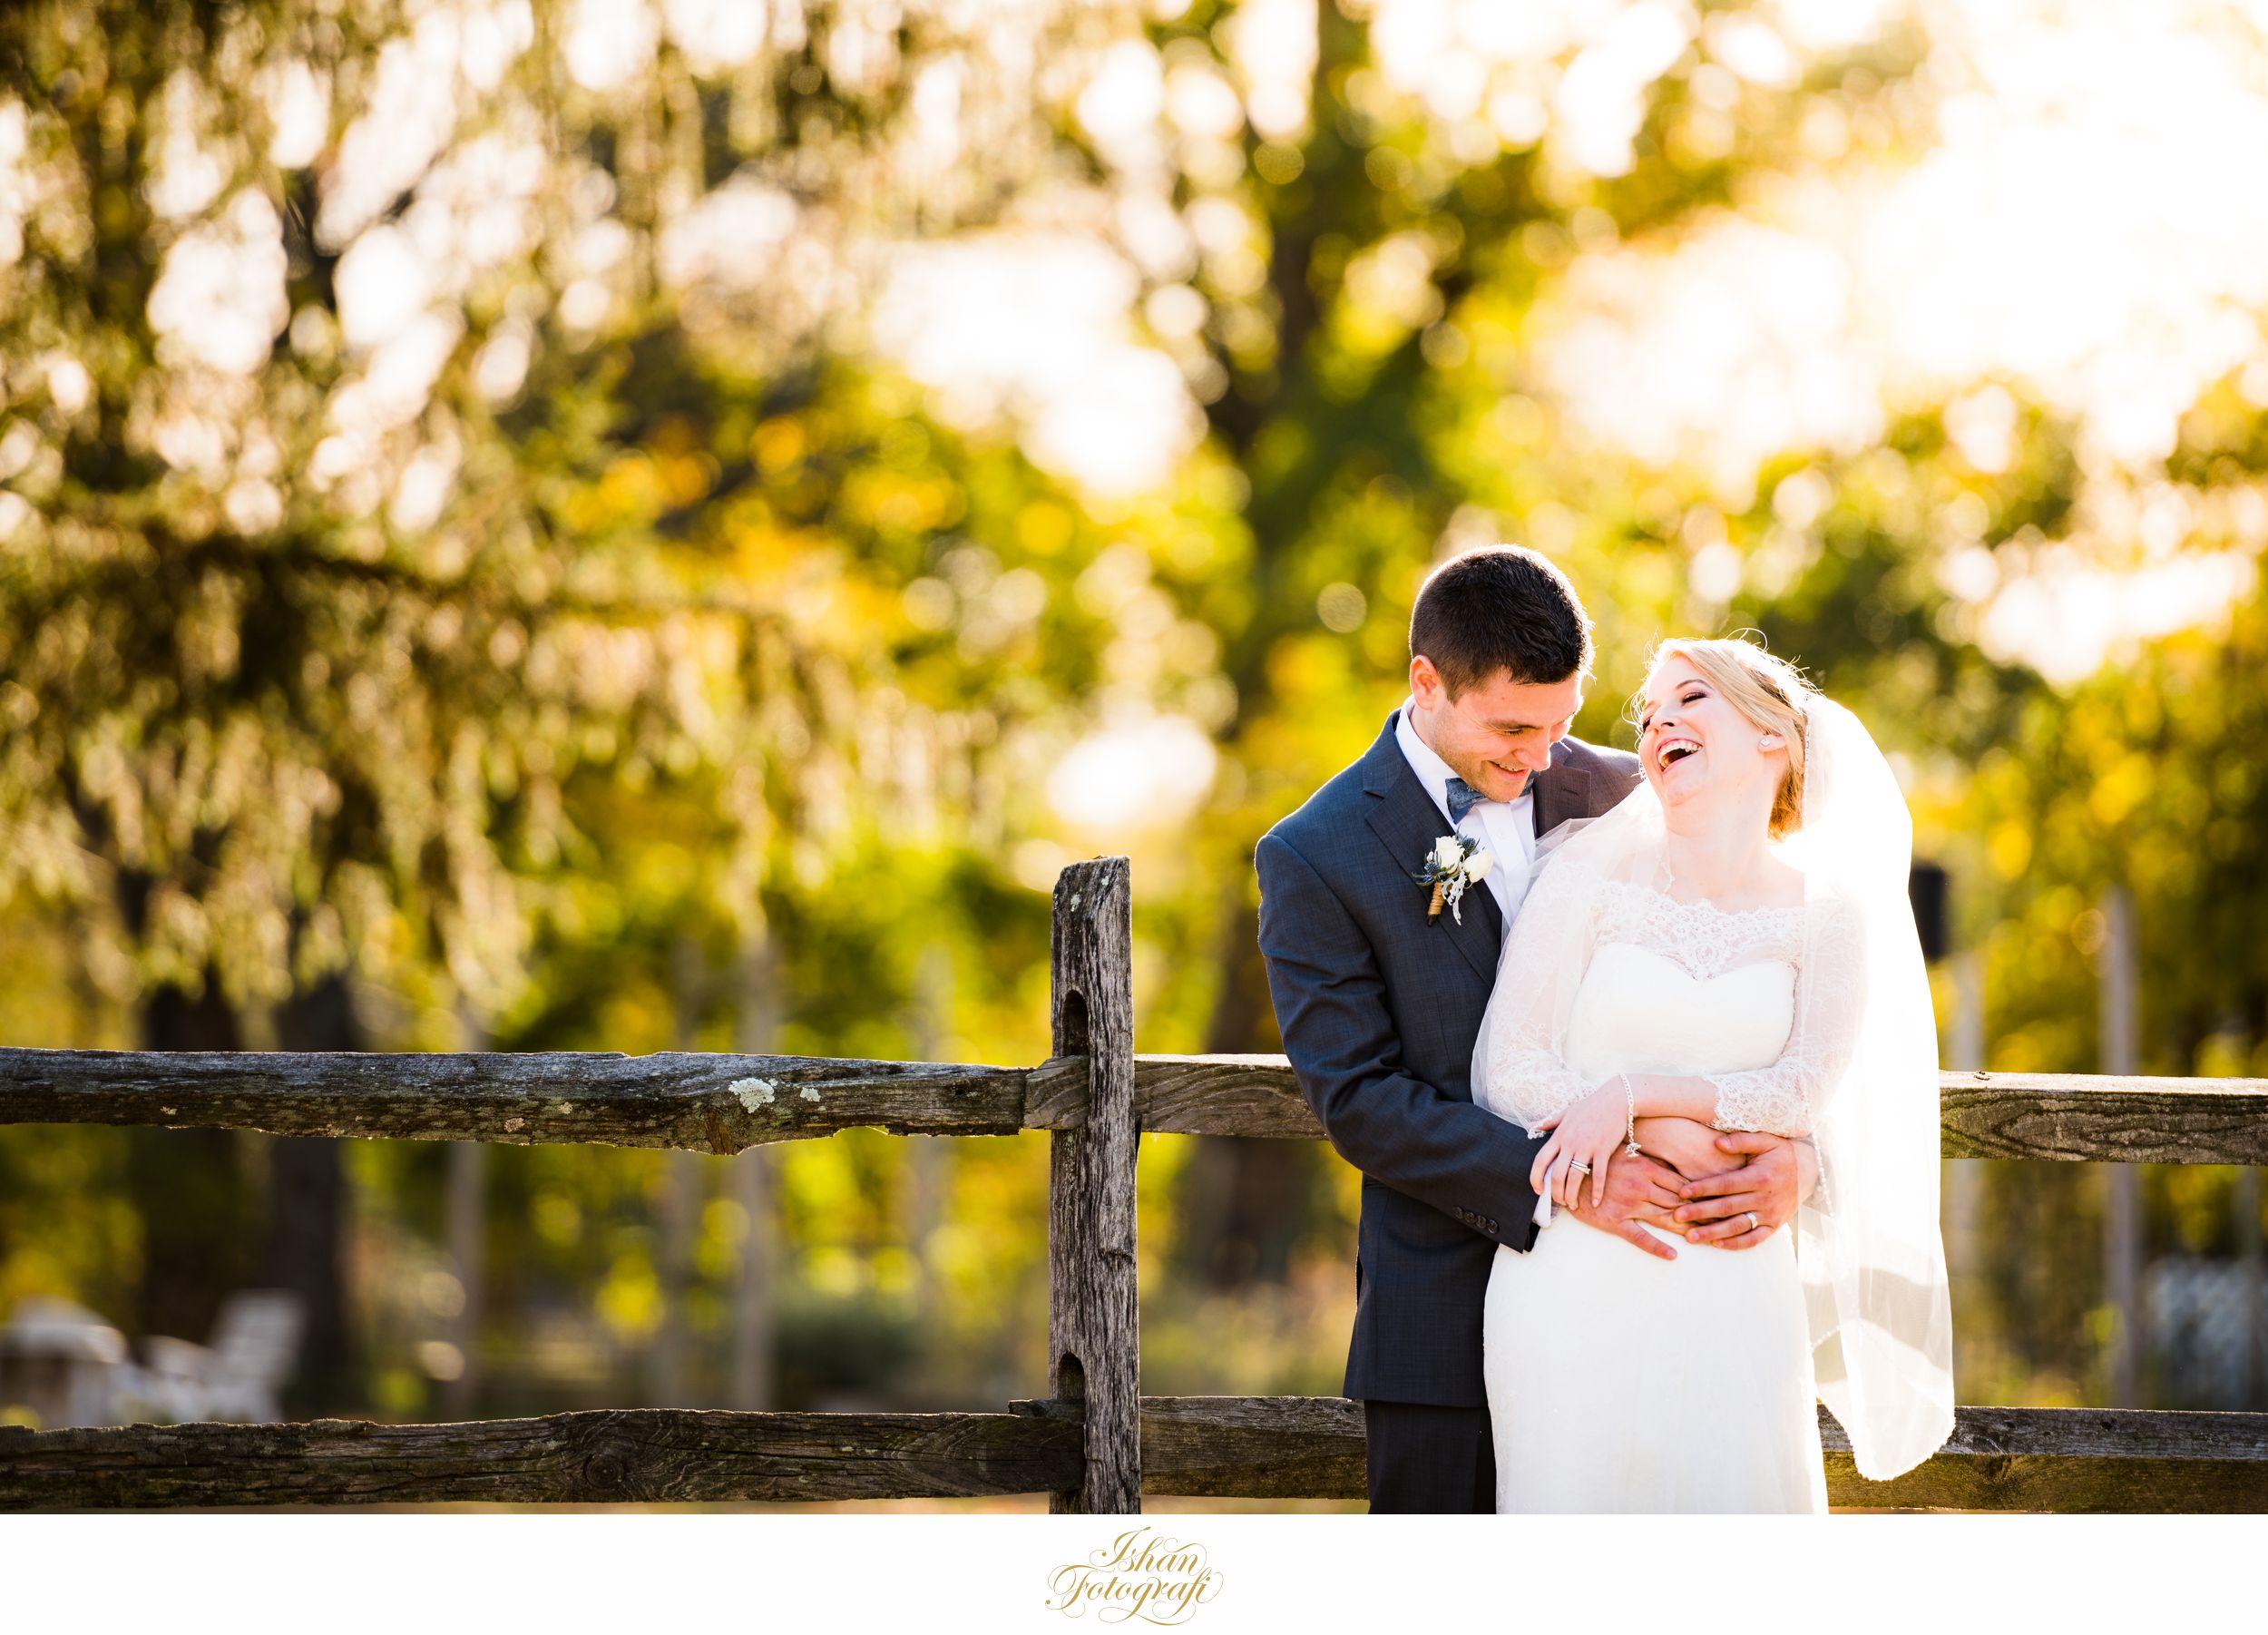 davids-country-inn-wedding-photo